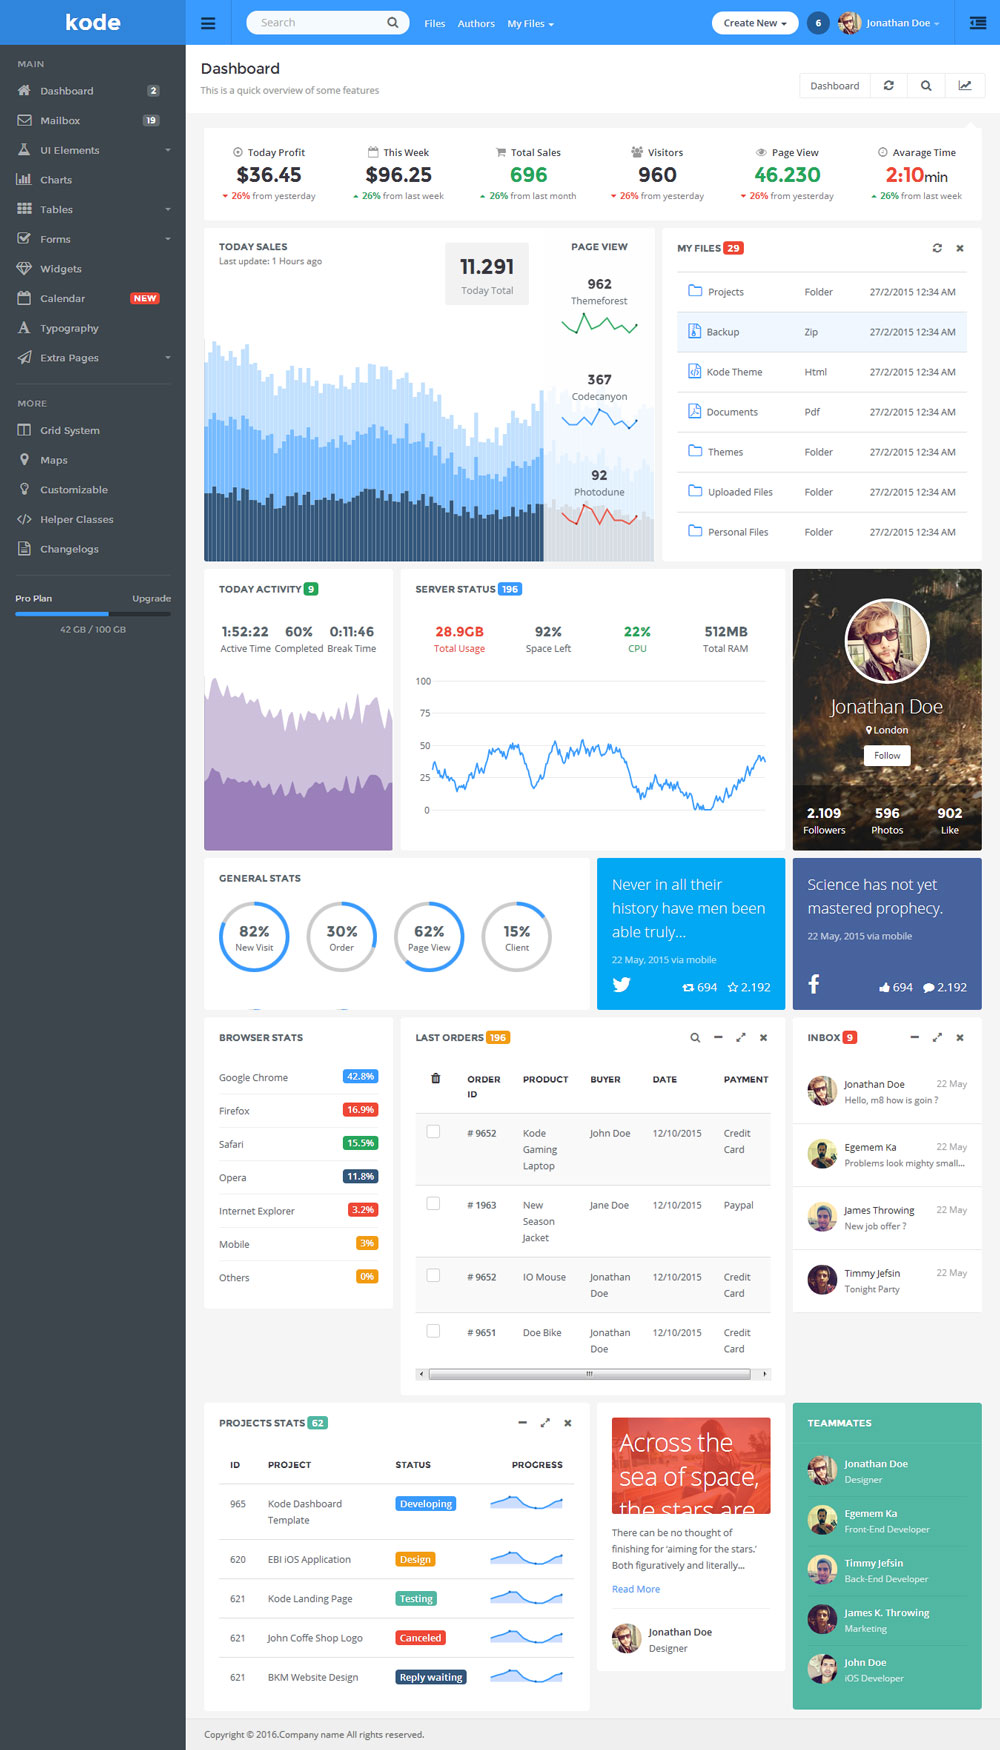 Bootstrap响应式蓝色后台UI框架模板